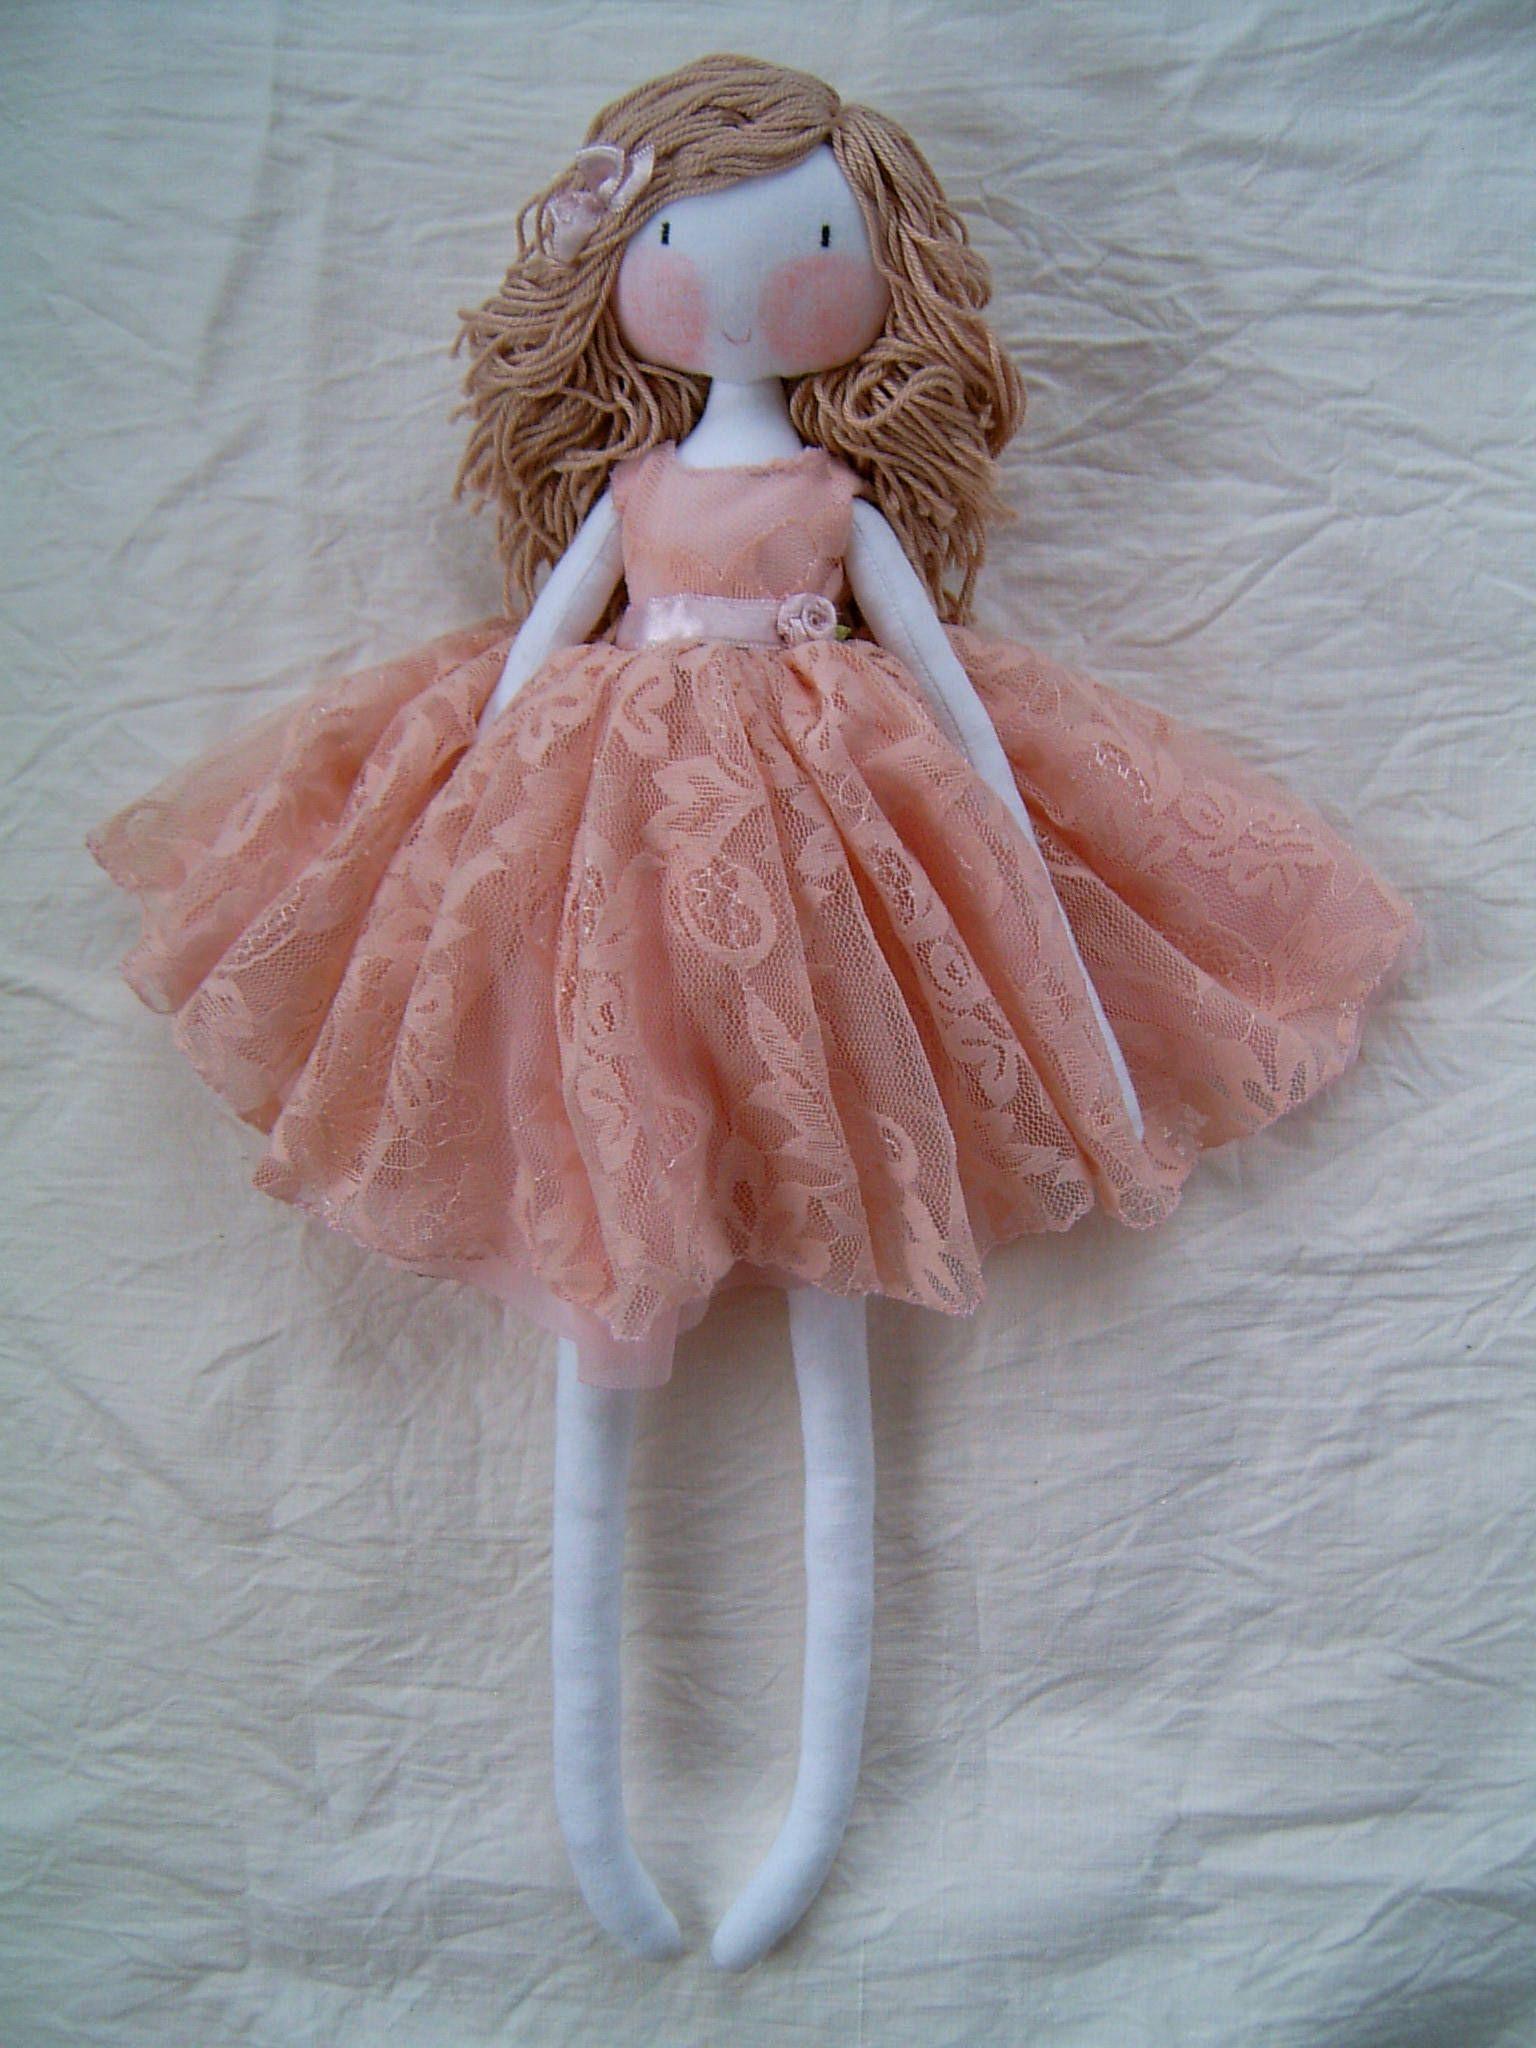 Handmade Dolls Sewing Homemade Dolls Fabric Dolls